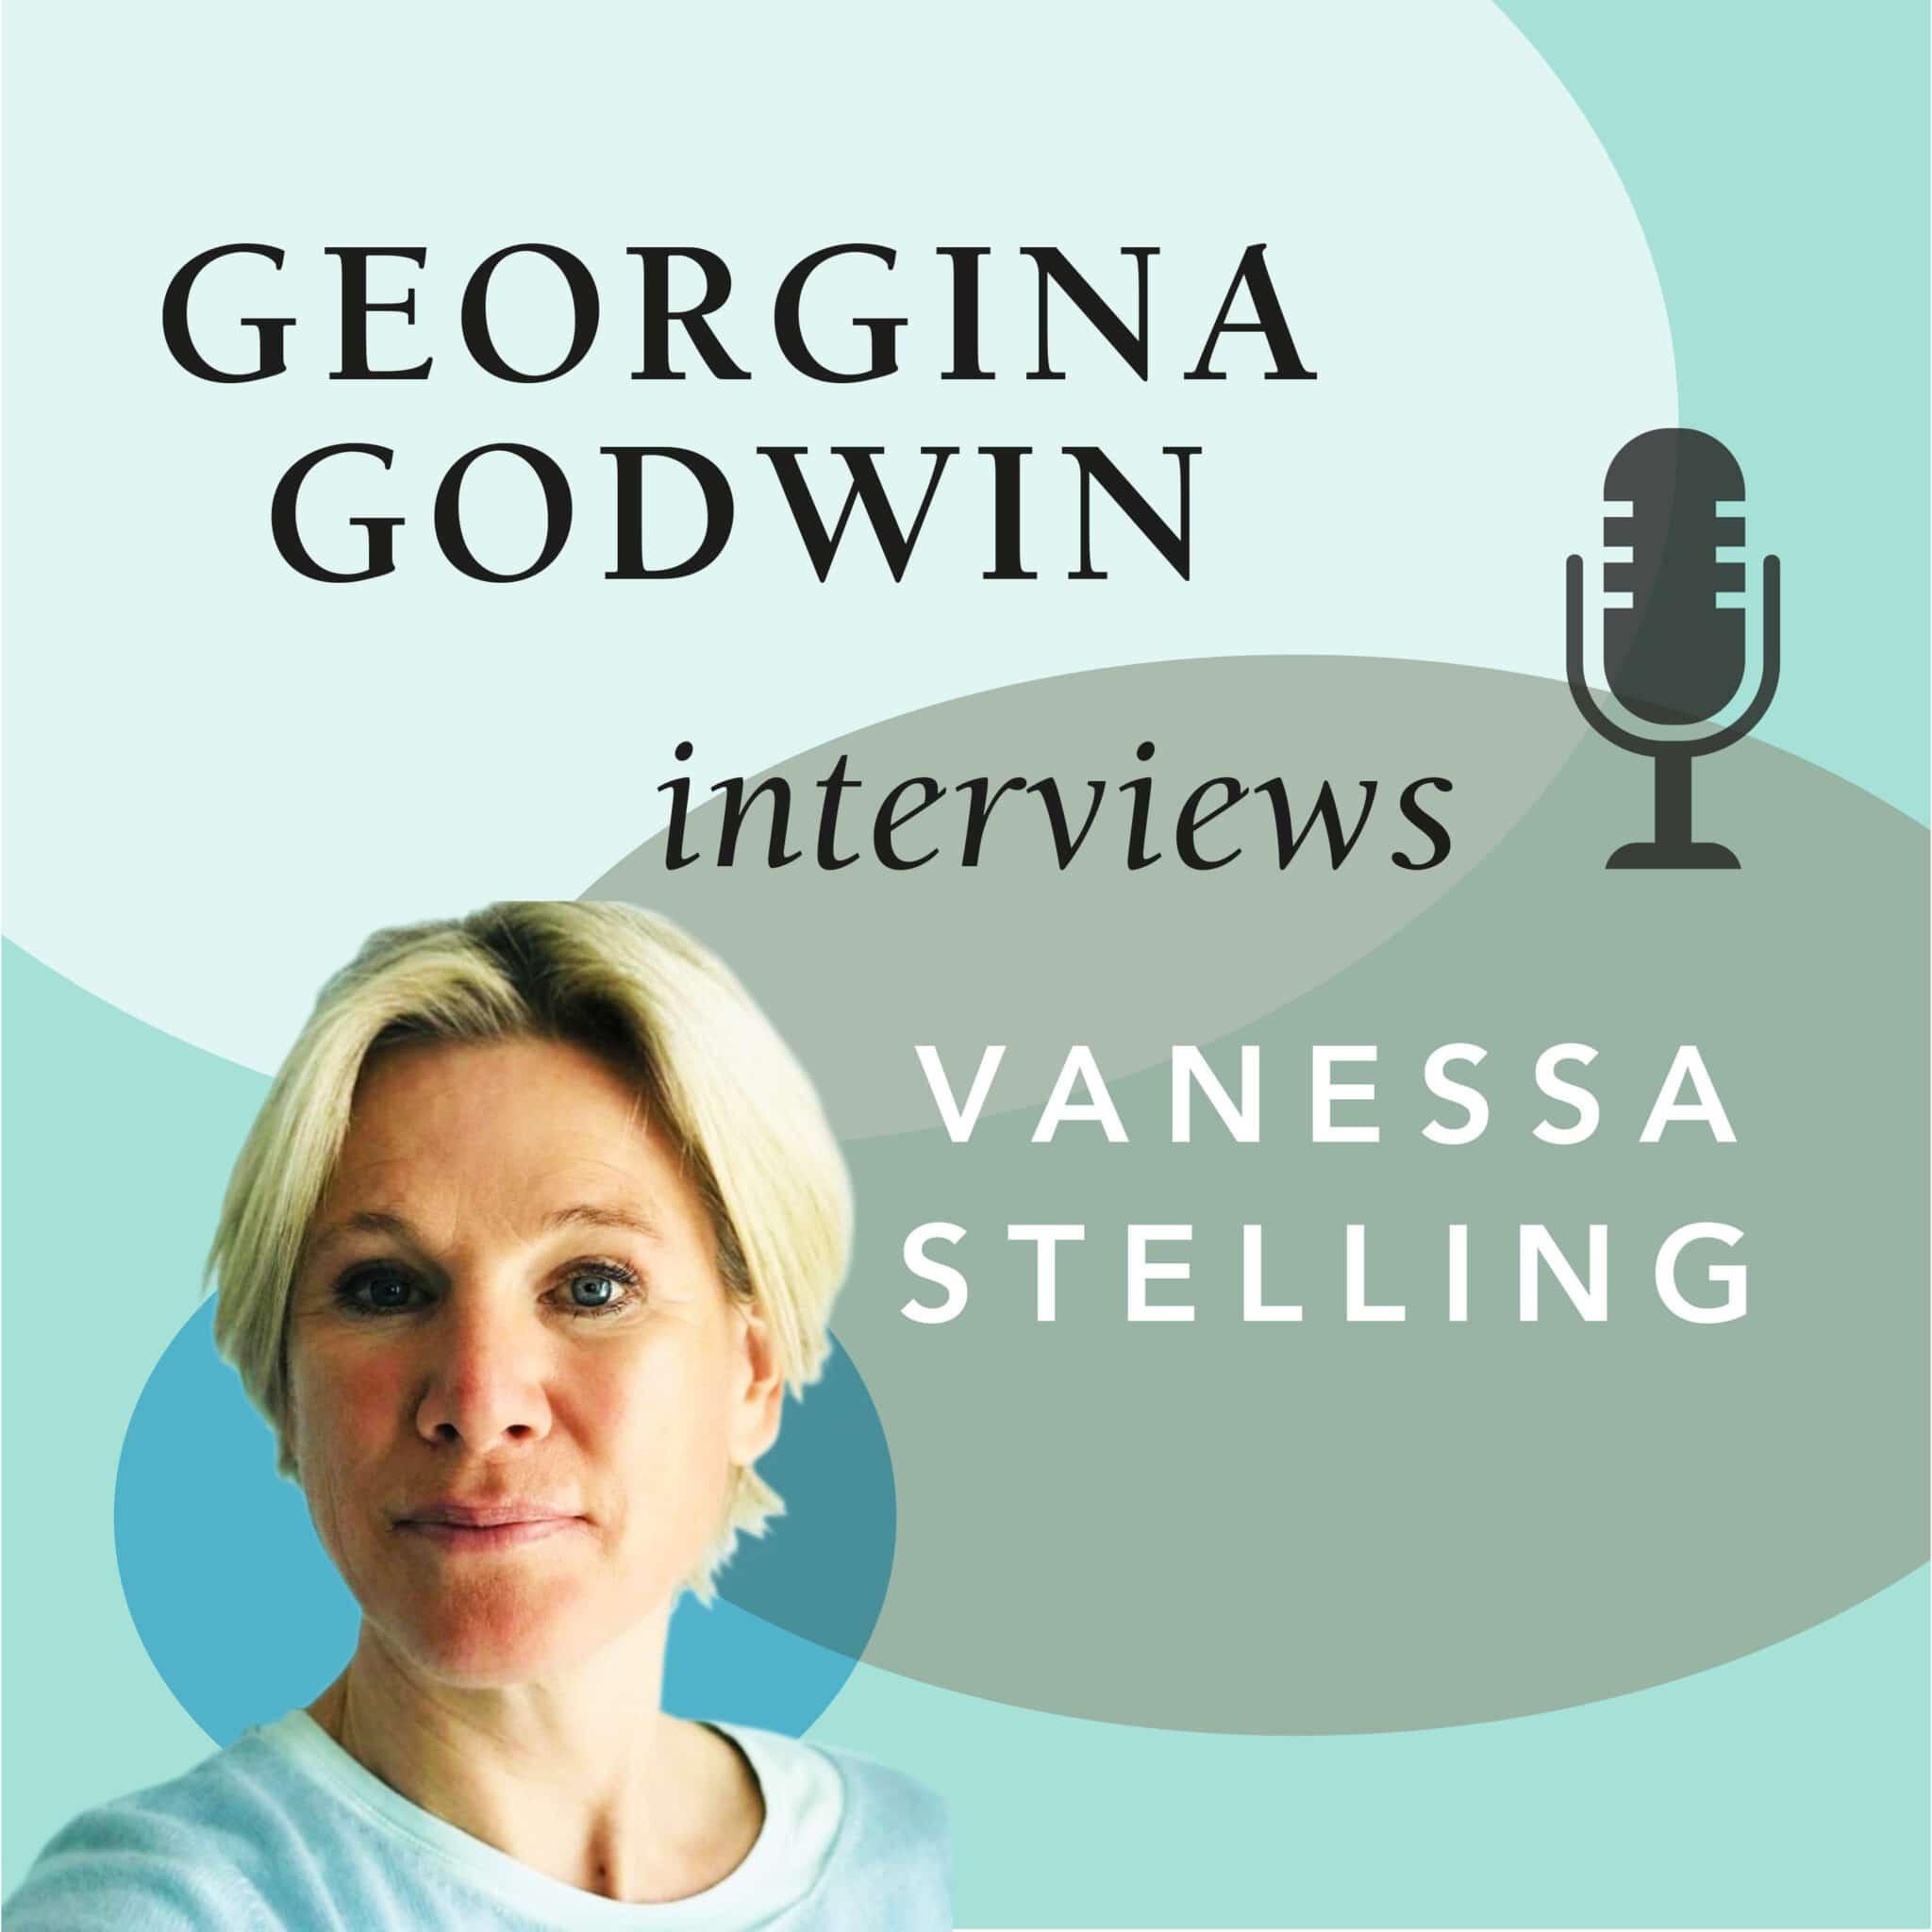 Georgina Godwin interviews Vanessa Stelling